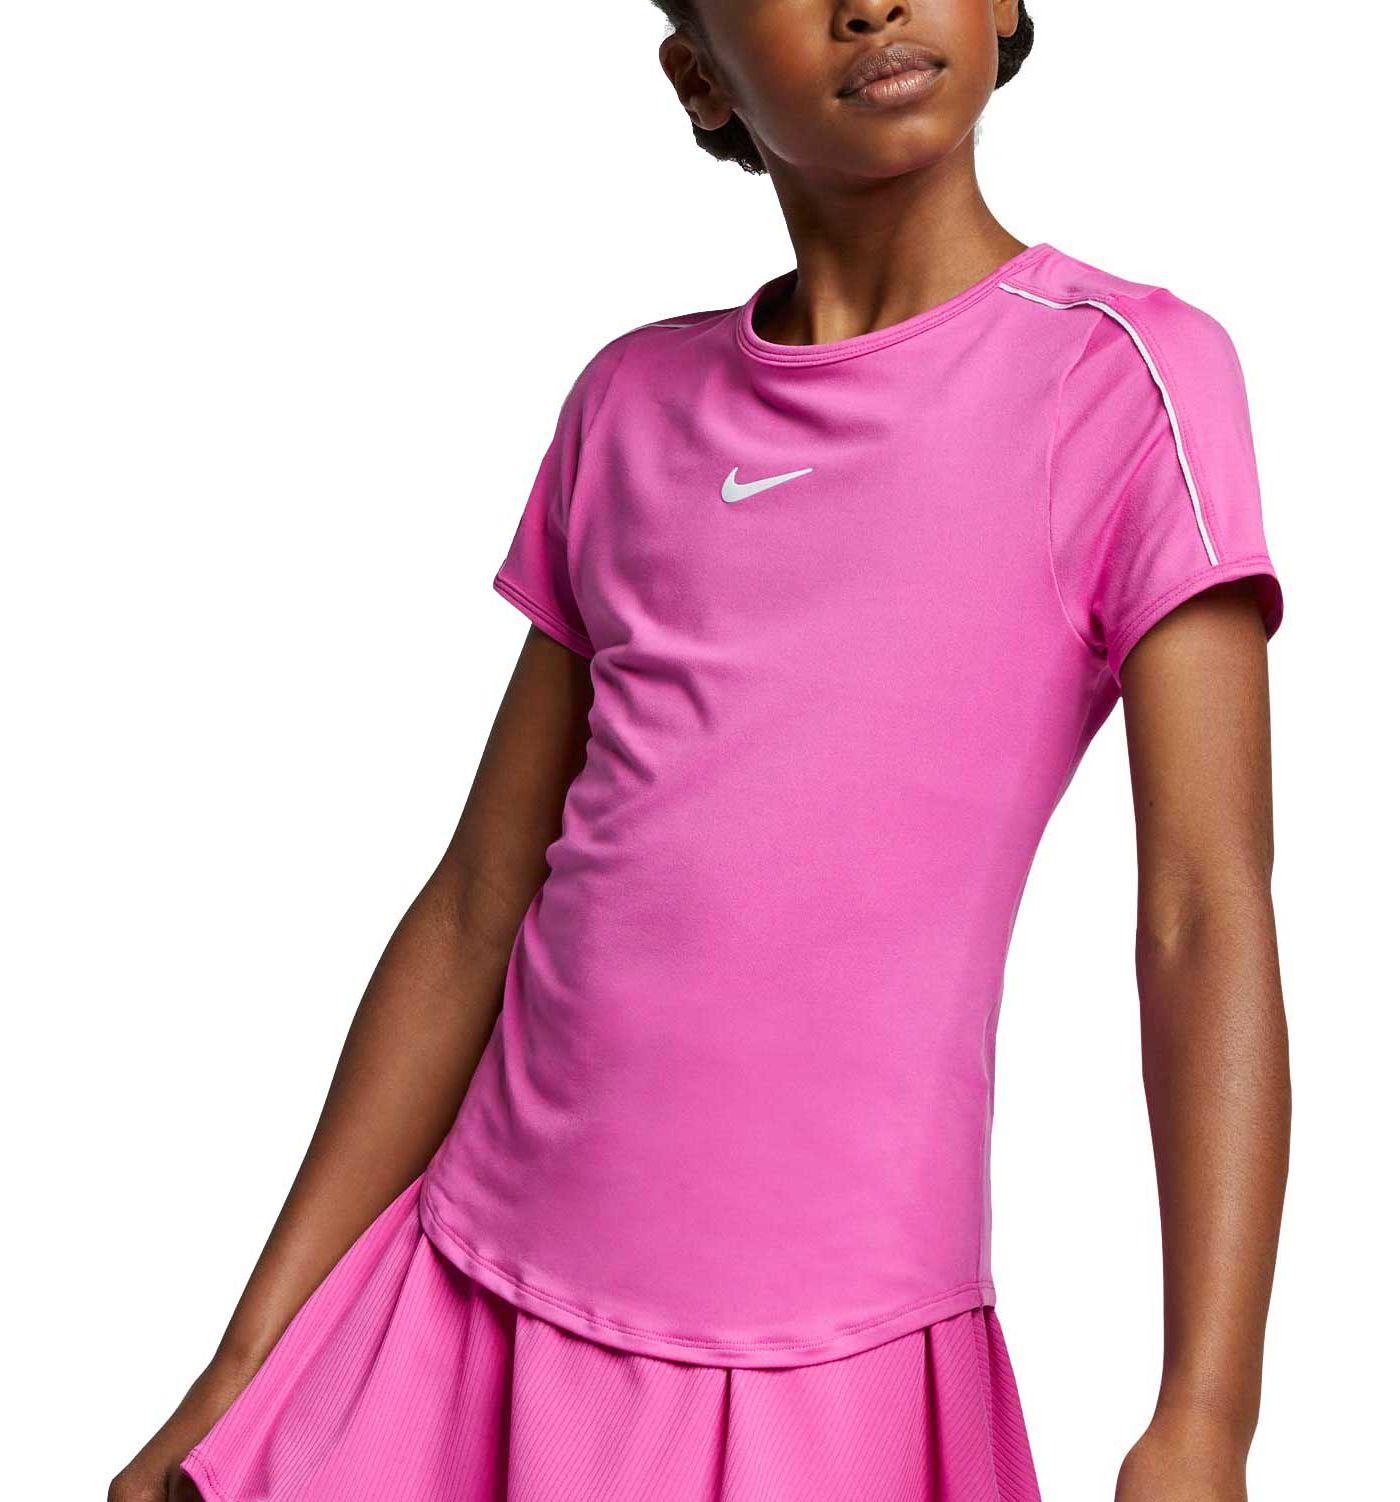 Nike Girls' NikeCourt Dri-FIT Tennis Shirt